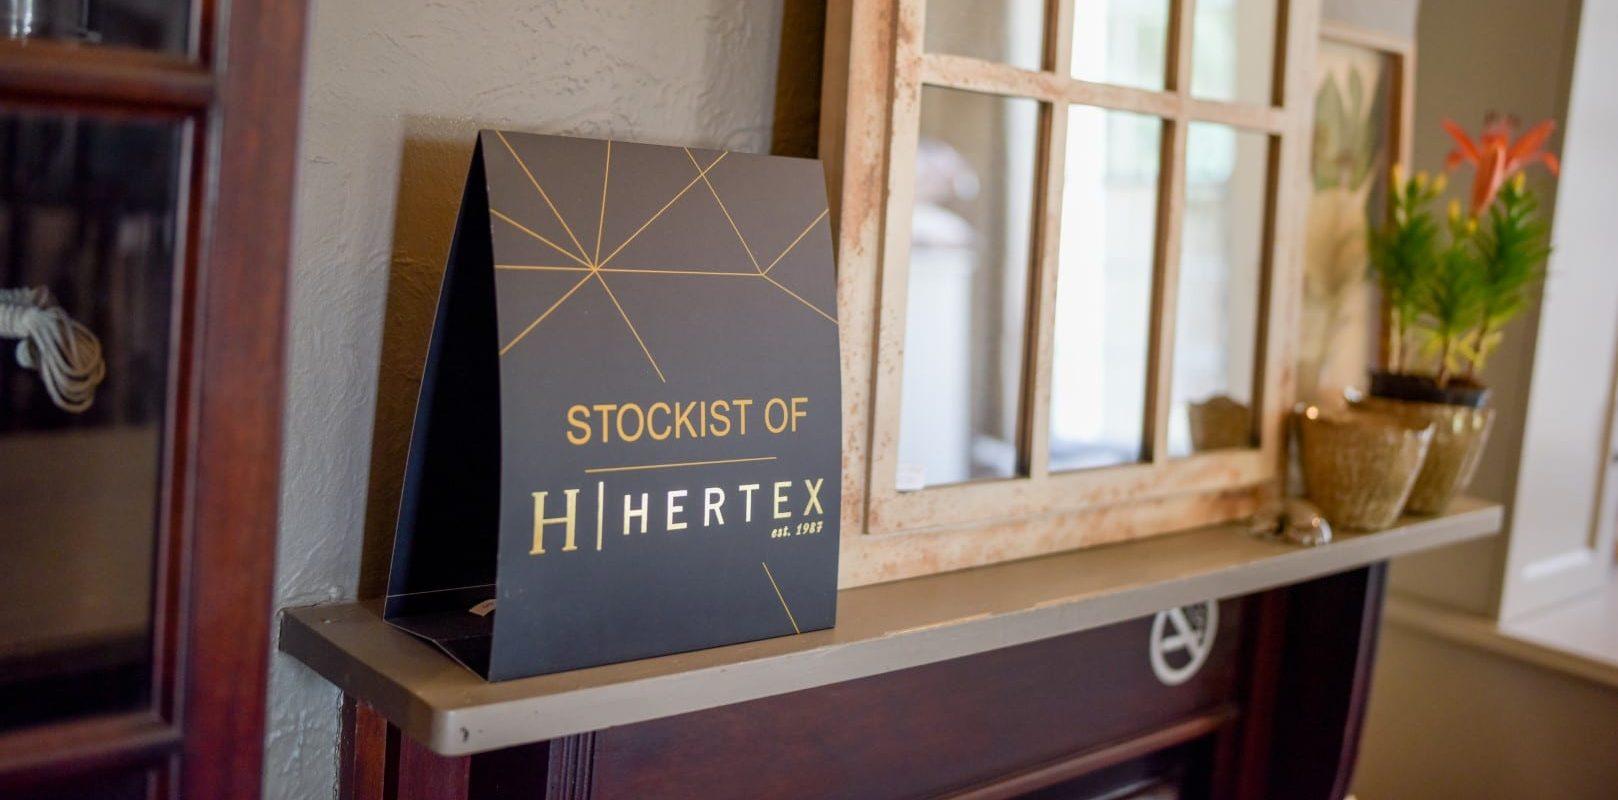 BillyPhillips Stocks Hertex Products